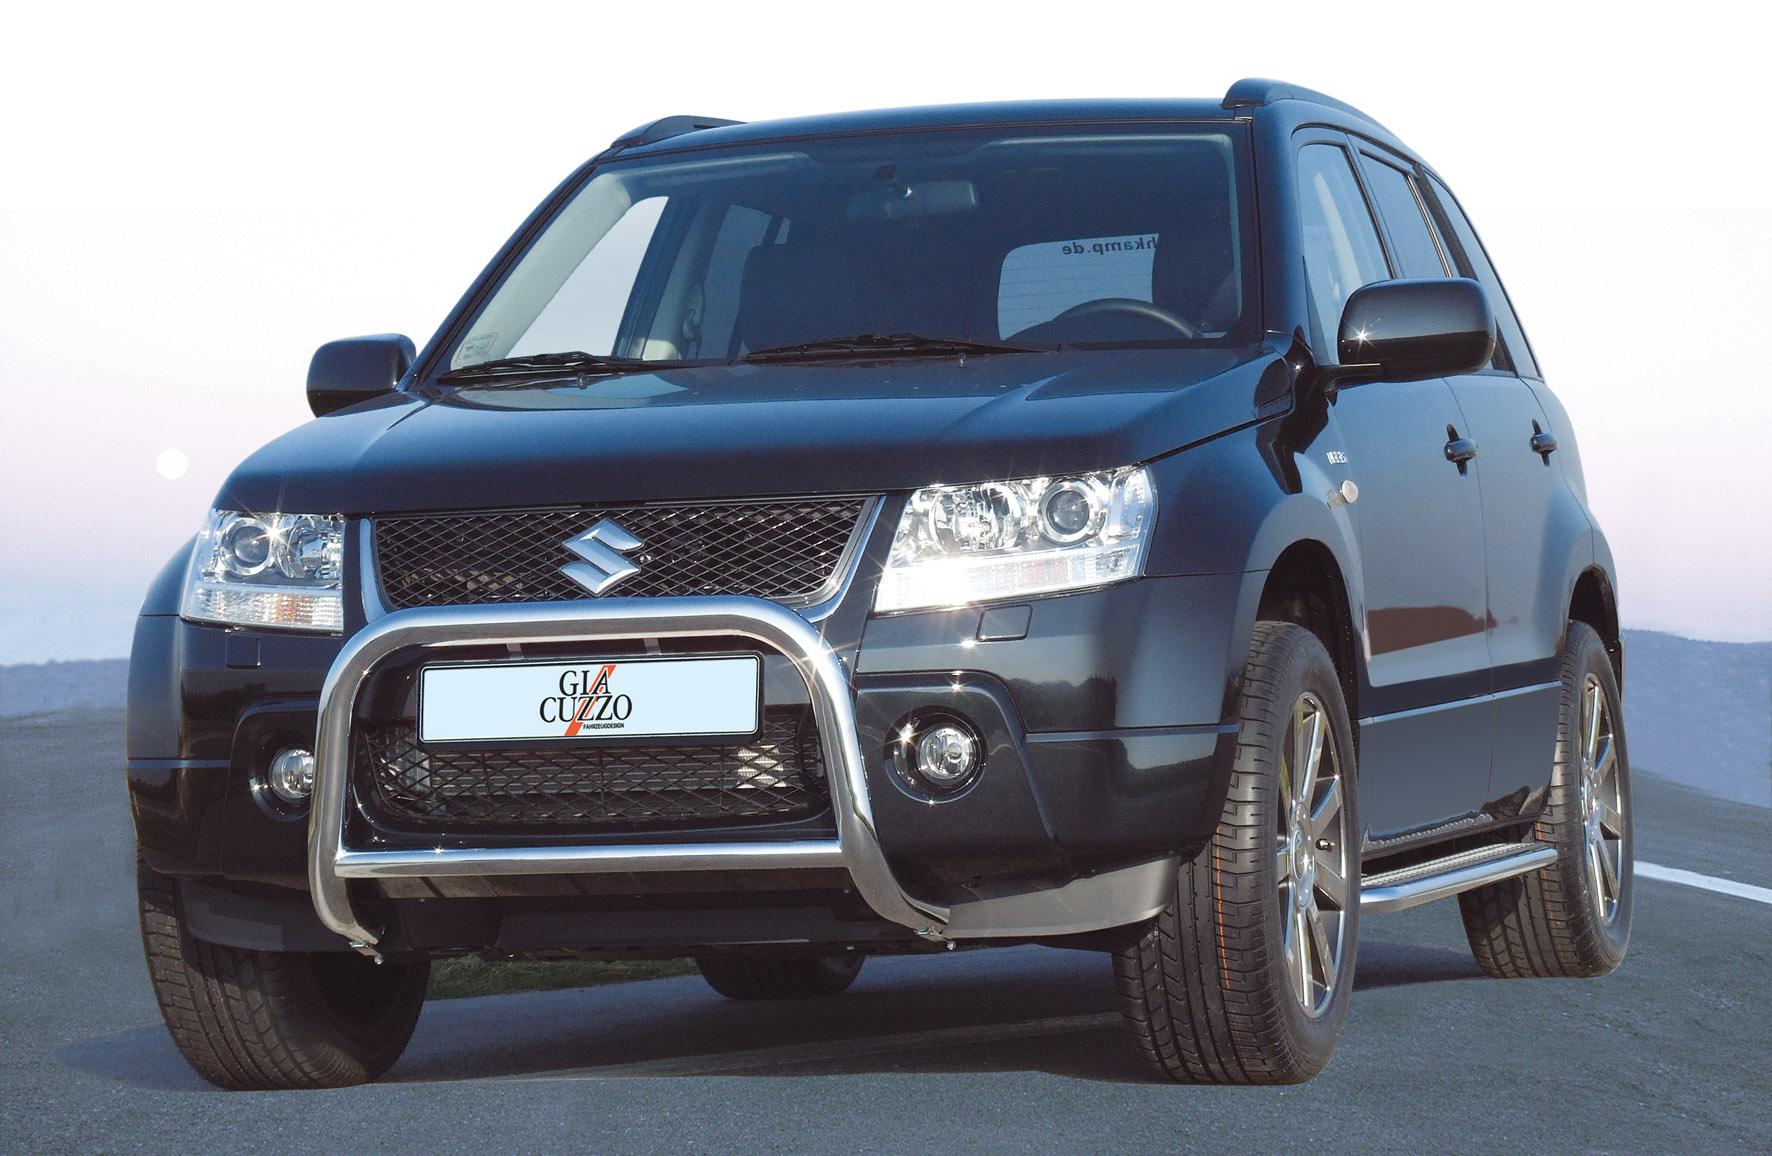 Giacuzzo Fahrzeugdesign - Tuning für Suzuki Grand Vitara